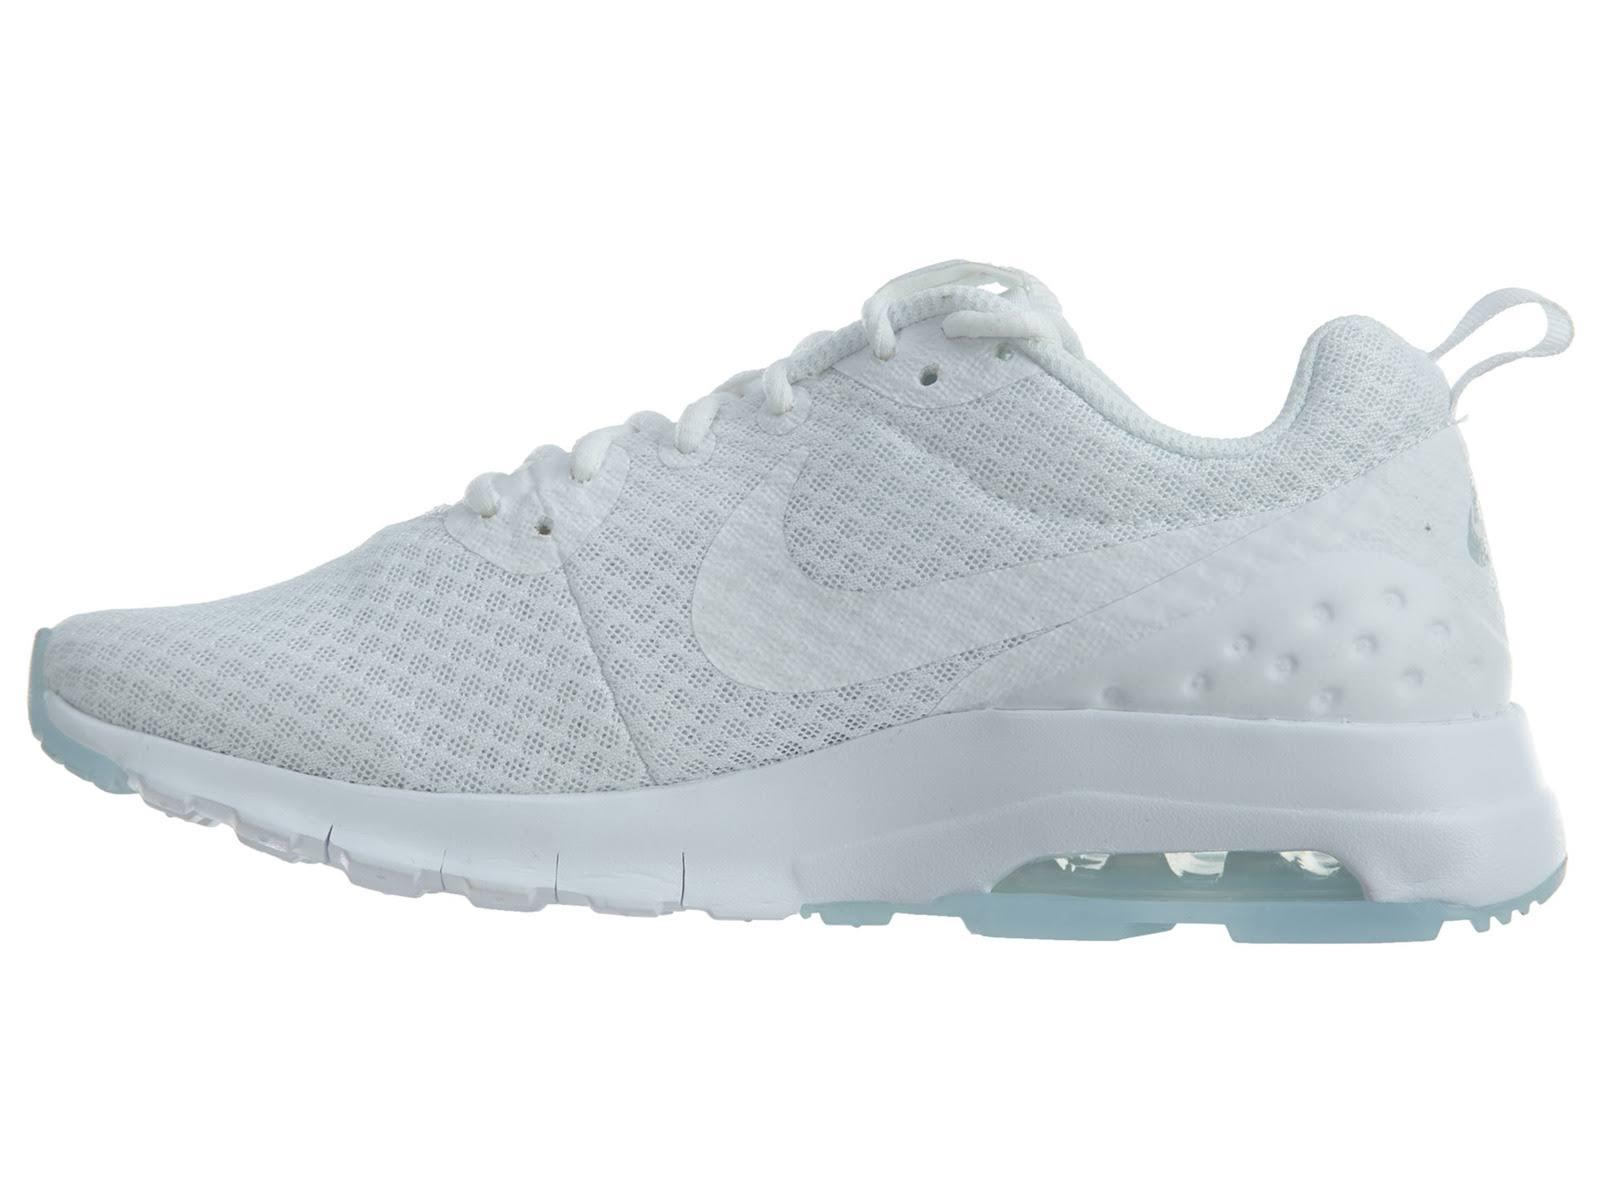 Hardloopschoen damesdamesdamesdamesdamesdameszwartwit voor Nike damesdamesdamesdamesdamesdameszwartwit voor Nike Hardloopschoen Nmwn80vO